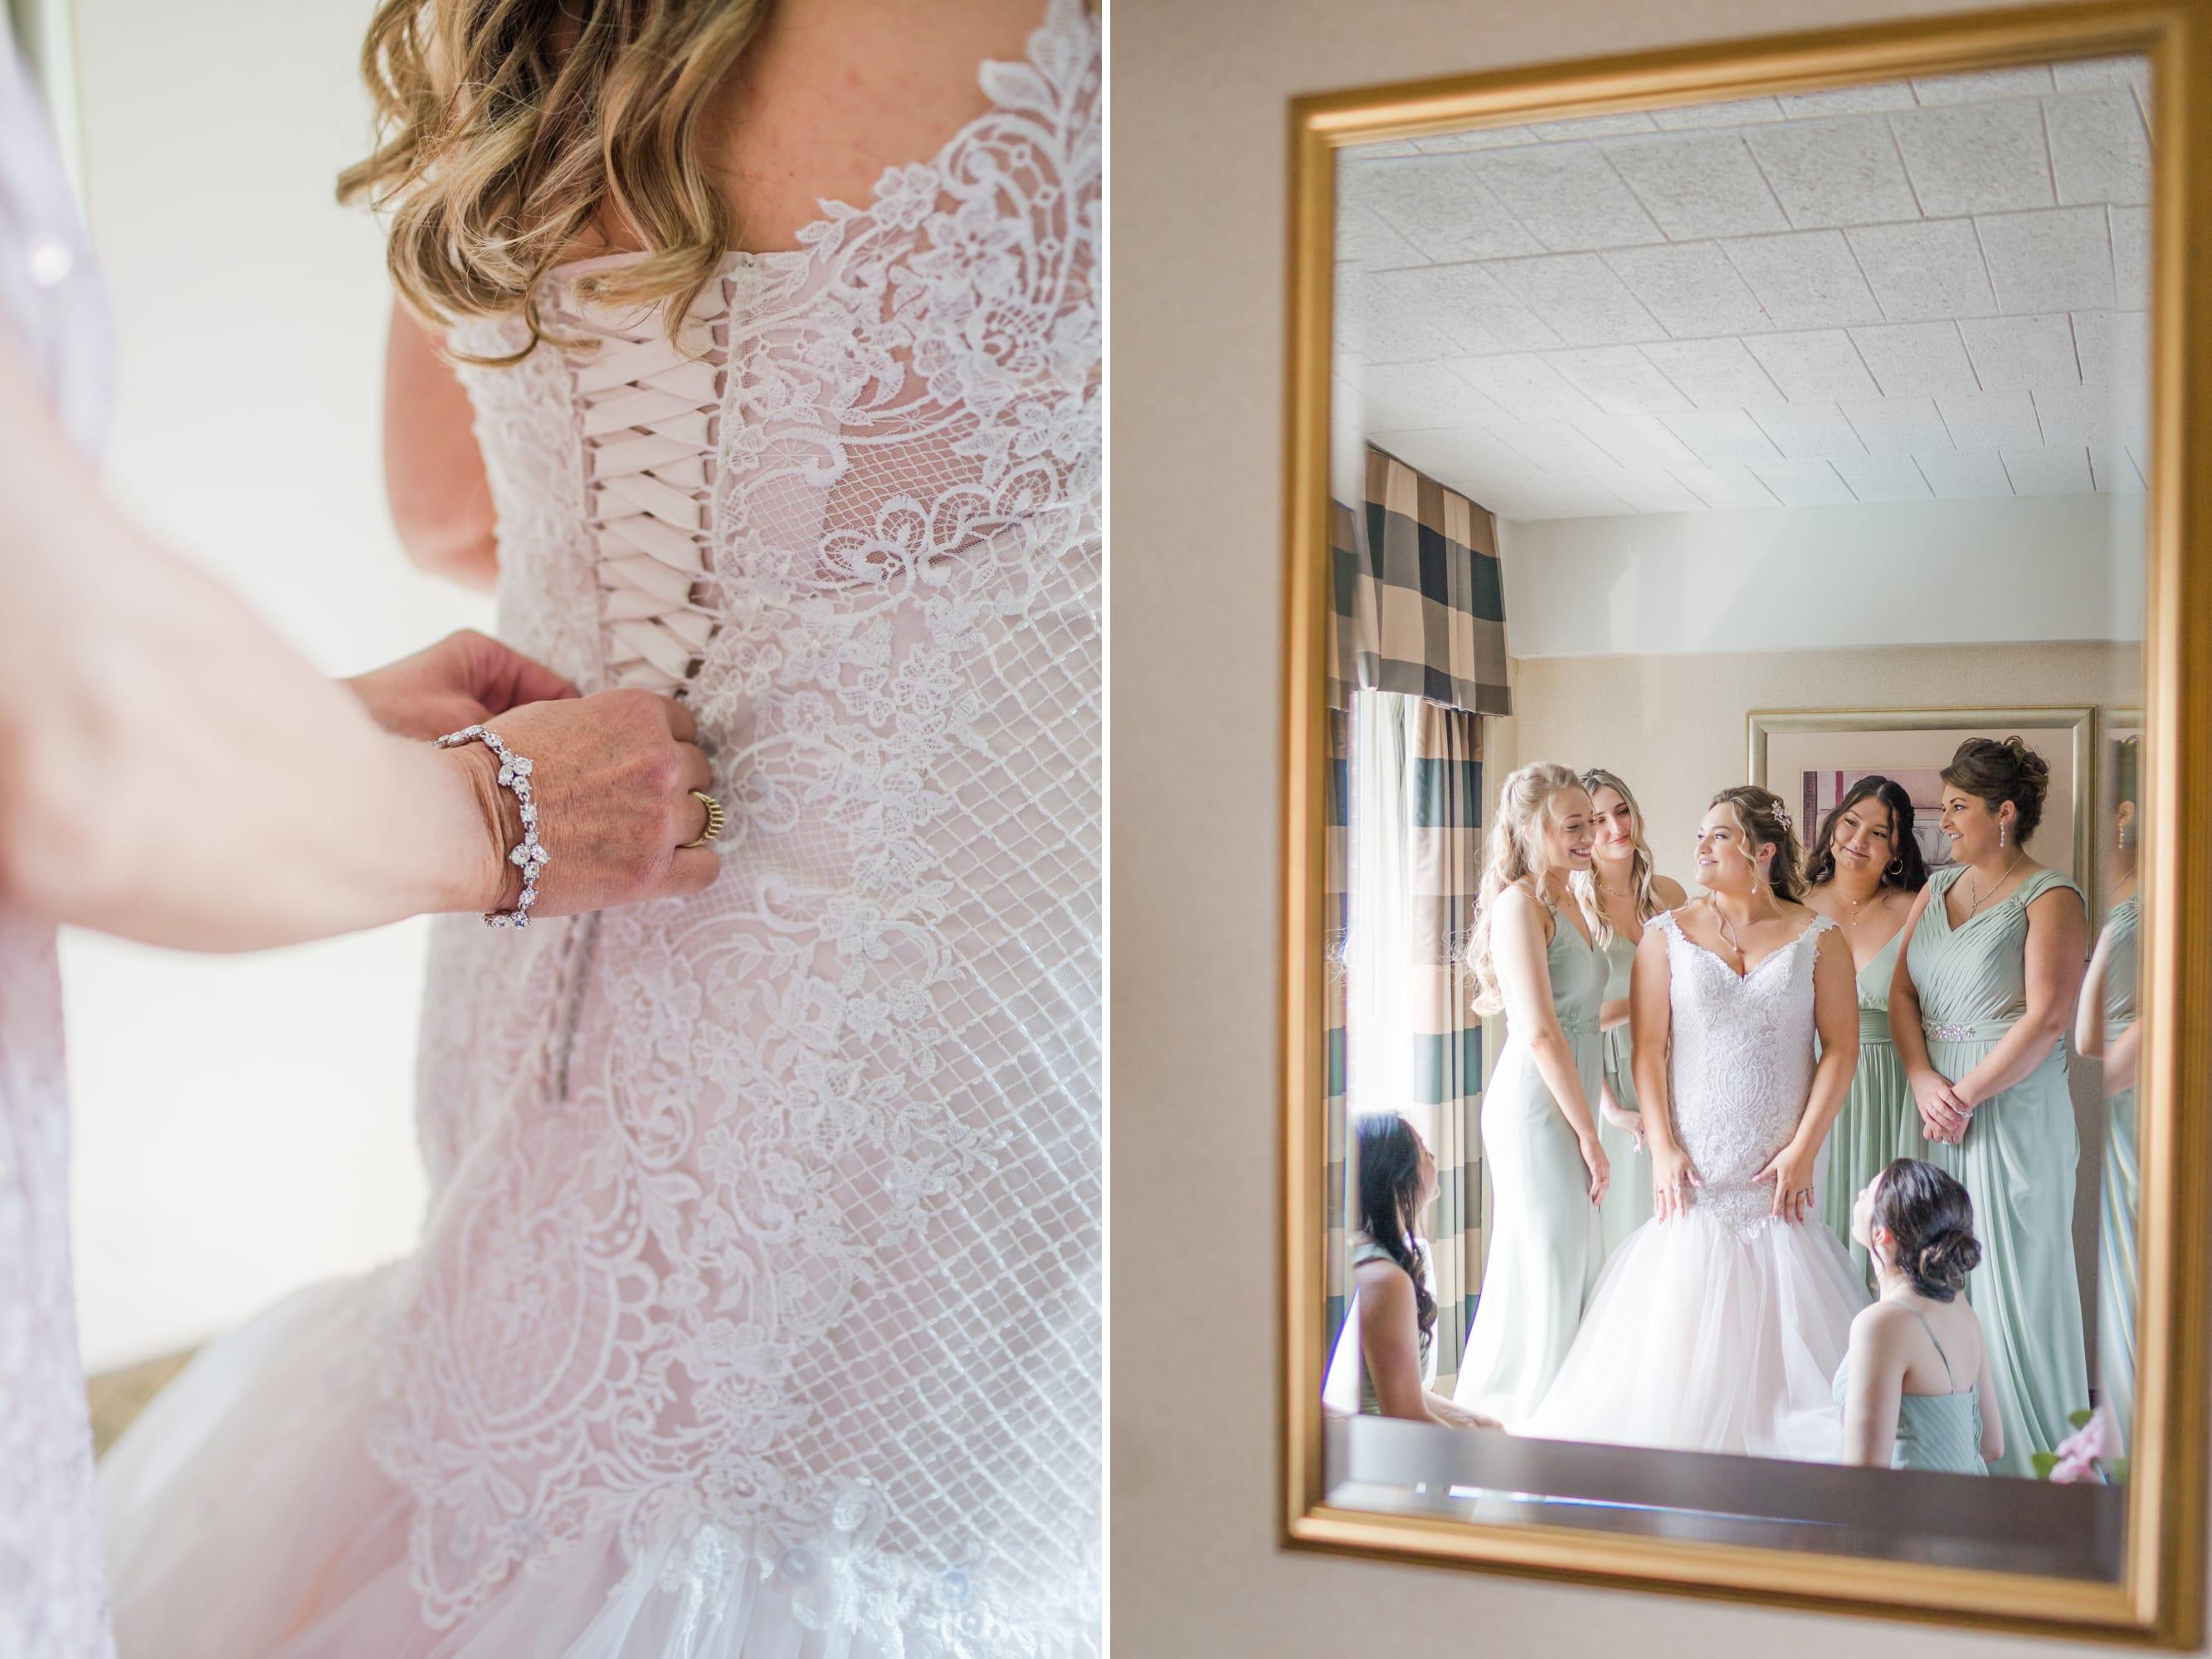 Central Pennsylvania PA summer wedding girls getting ready